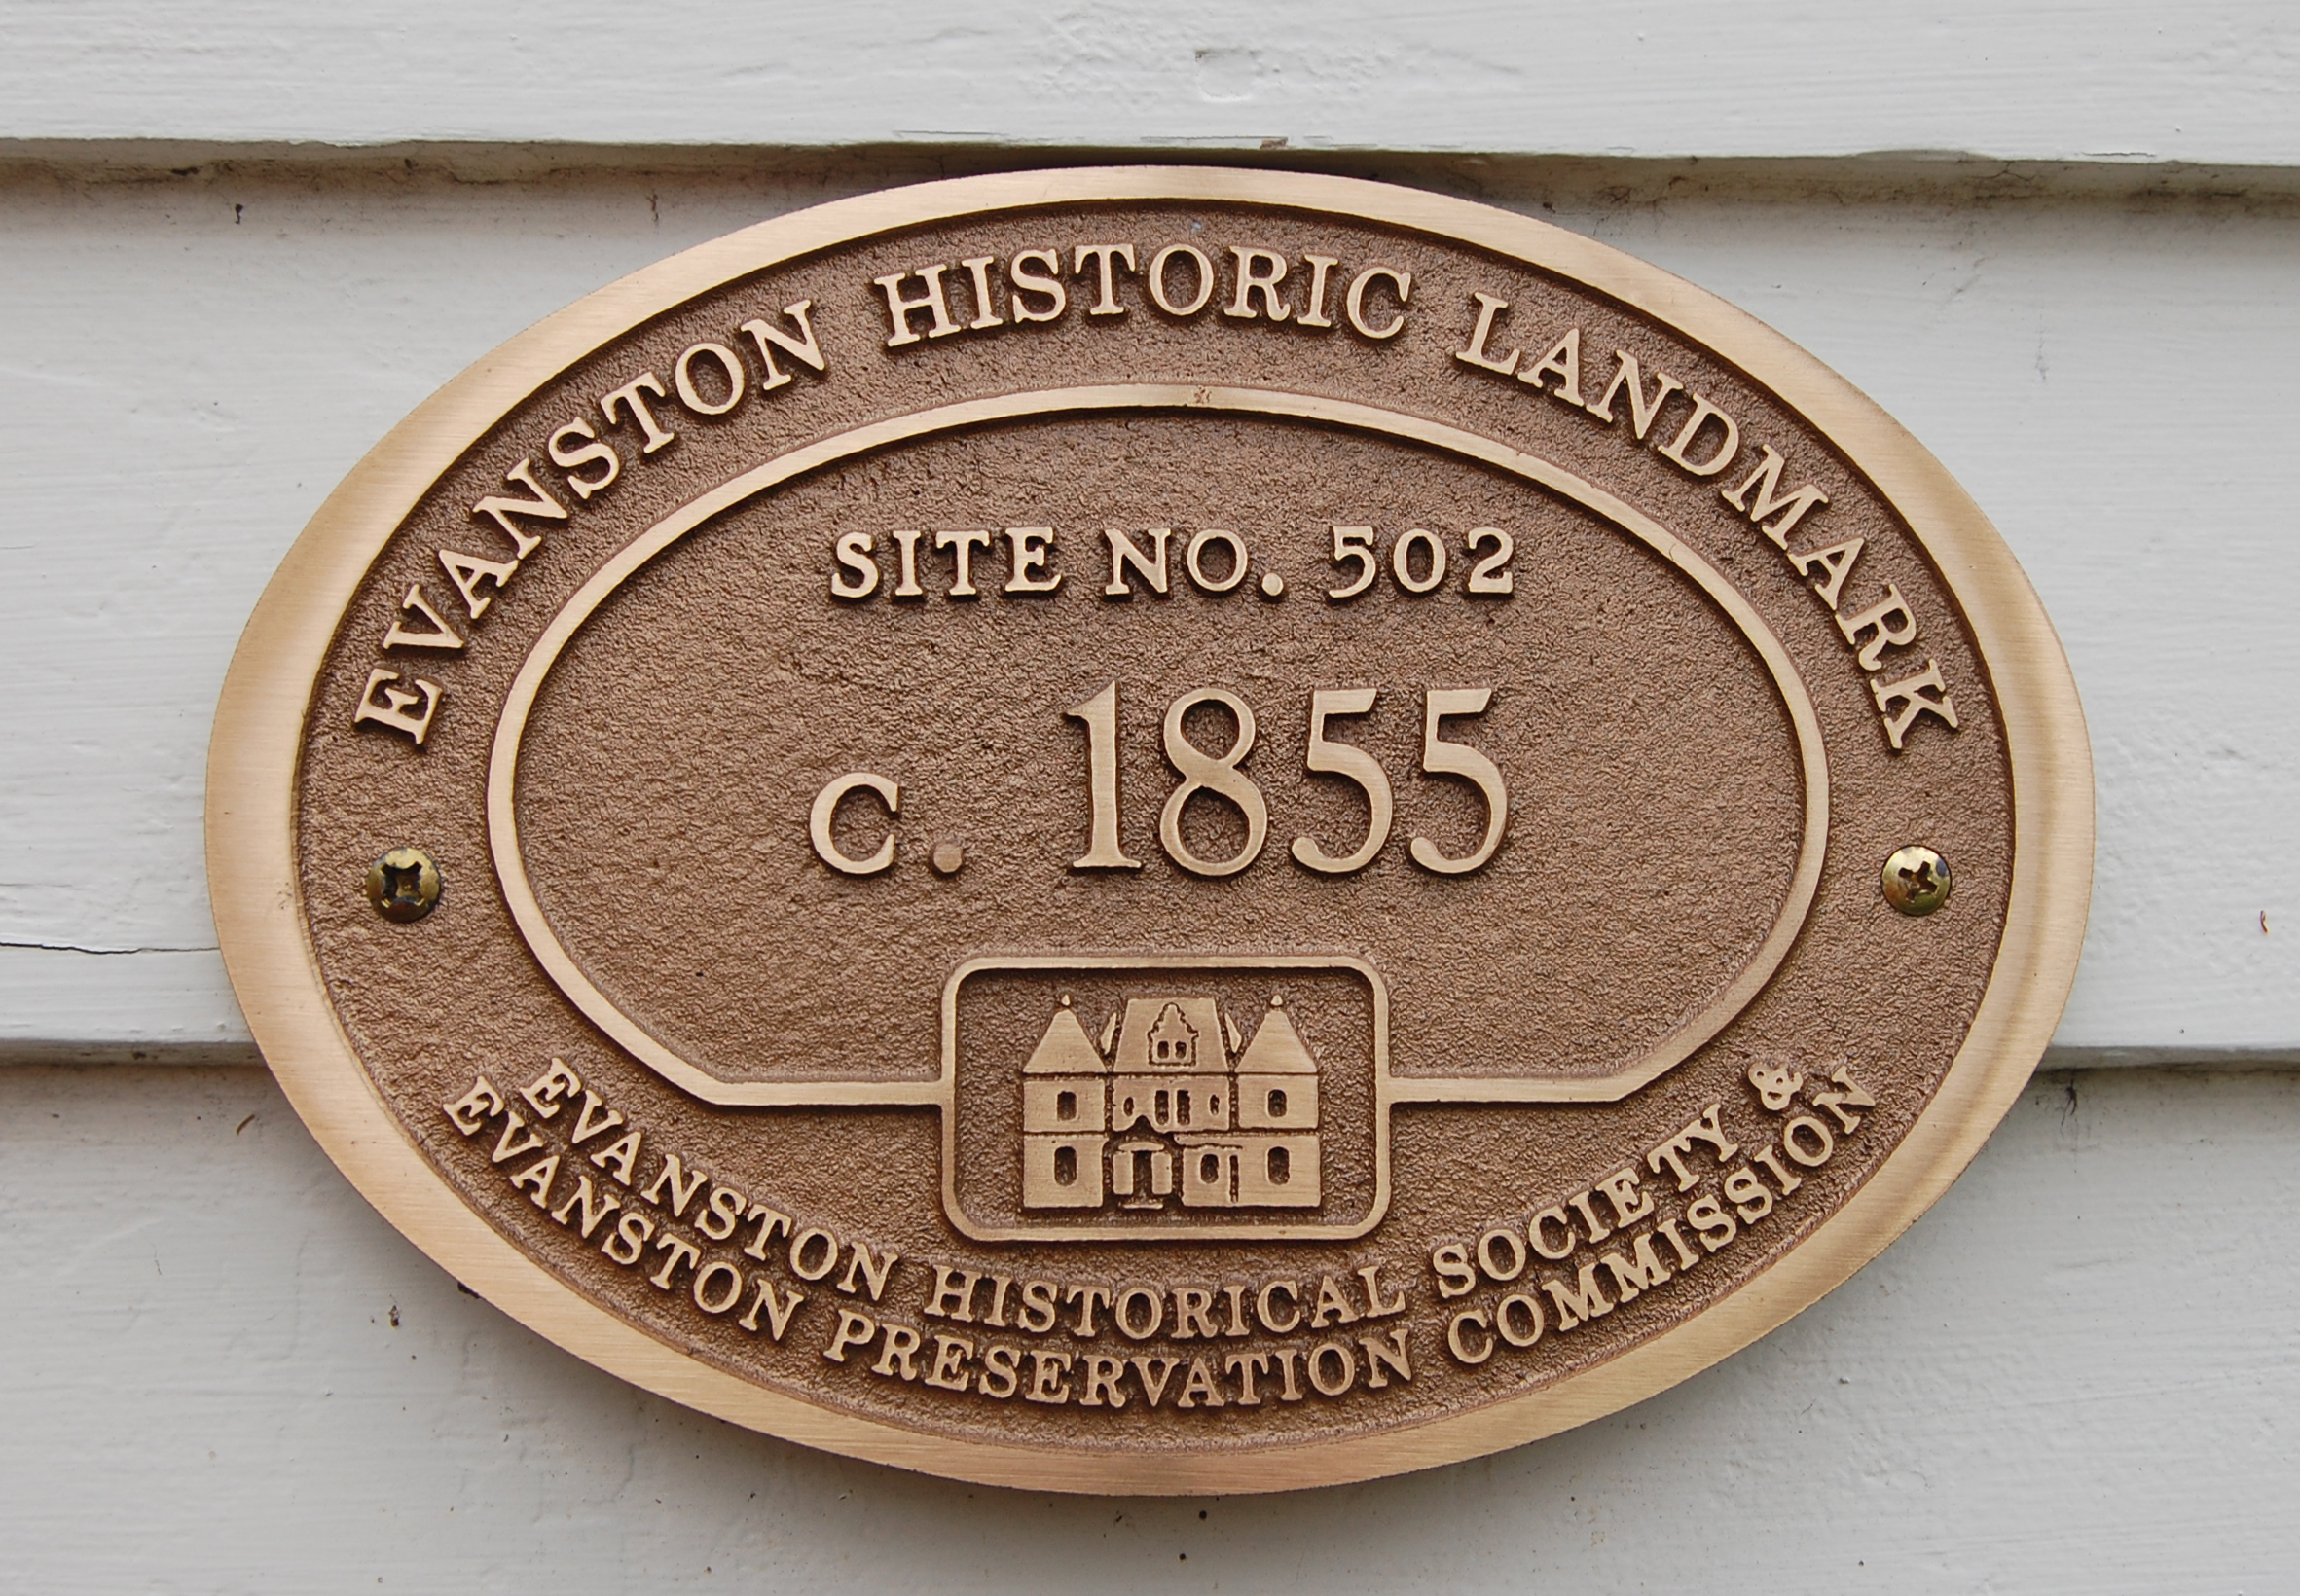 Evanston Historic Landmark, 1850s federal-style house, historic preservation, residential renovation, contextual design, Evanston Historical Society Preservation Commission